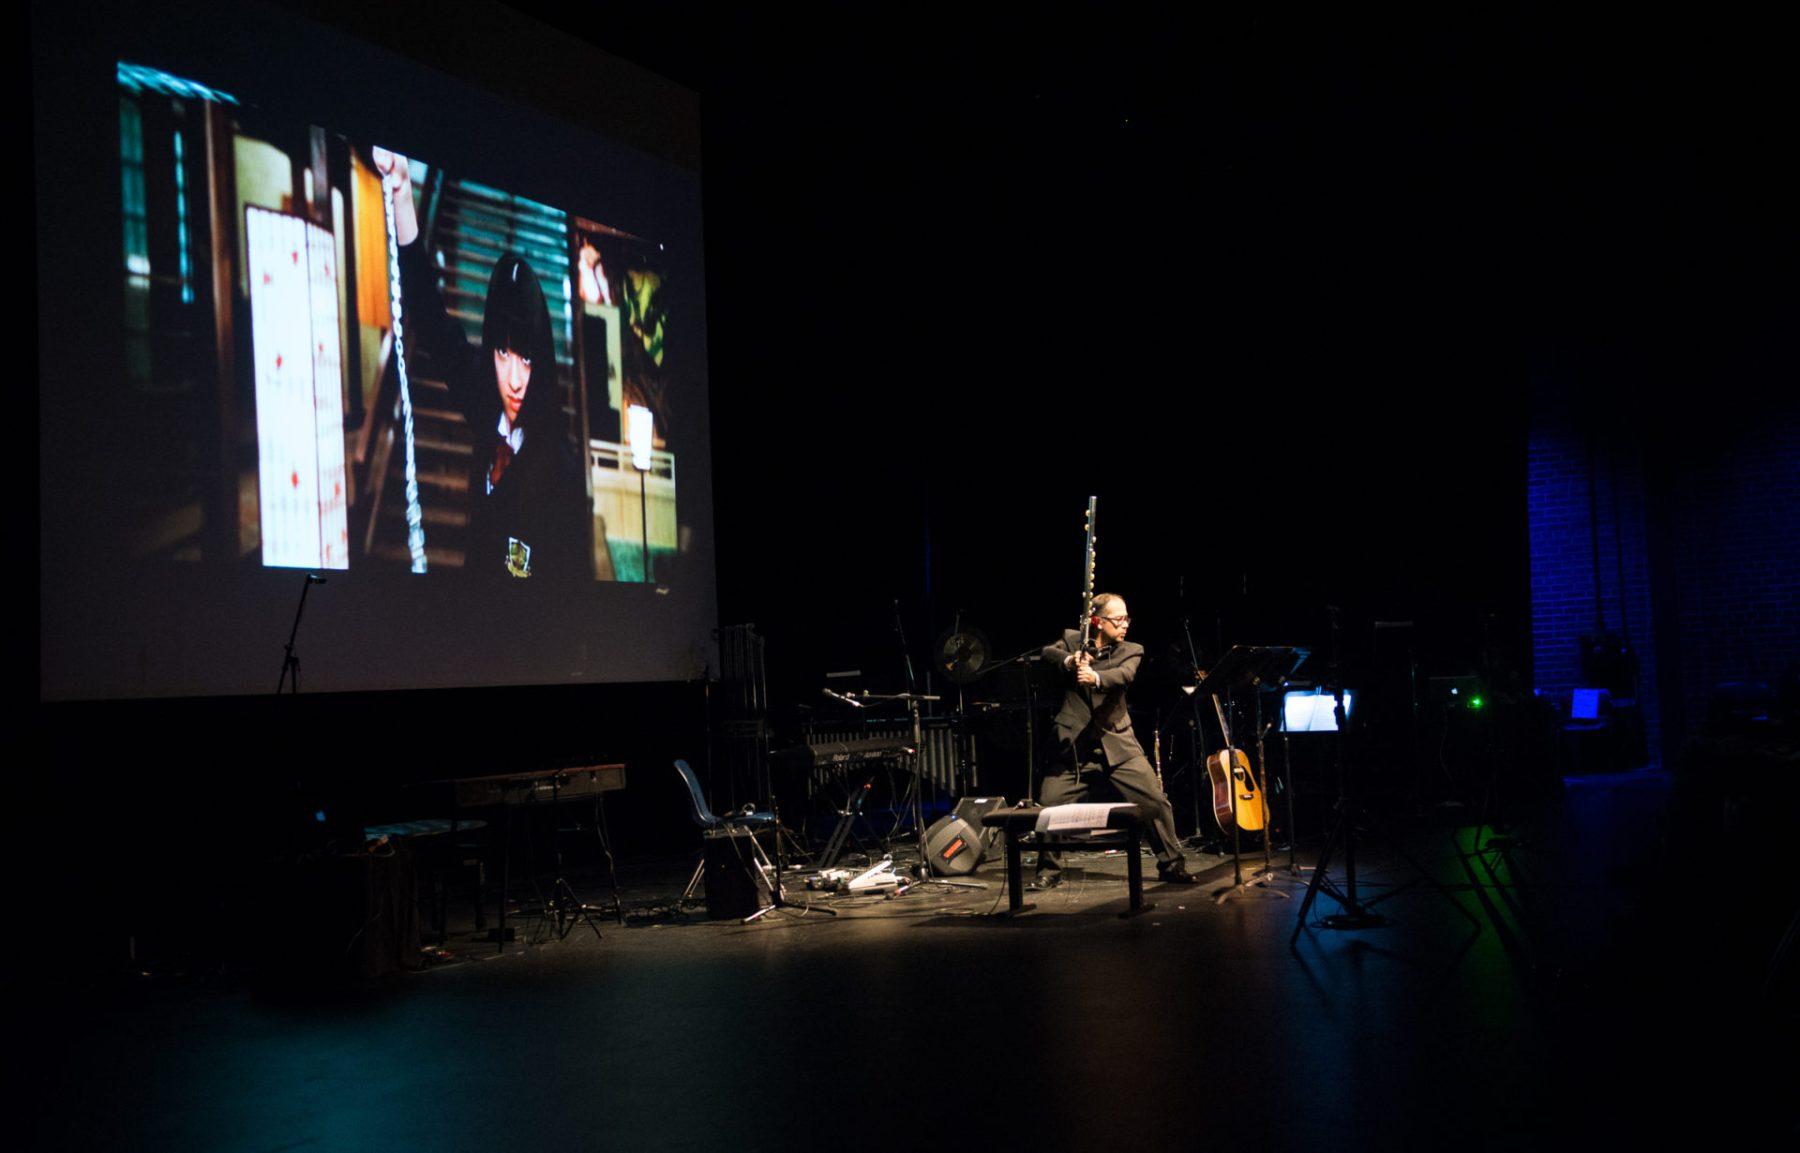 Mark Takeshi McGregor, Tarantino, Modulus Festival 2015